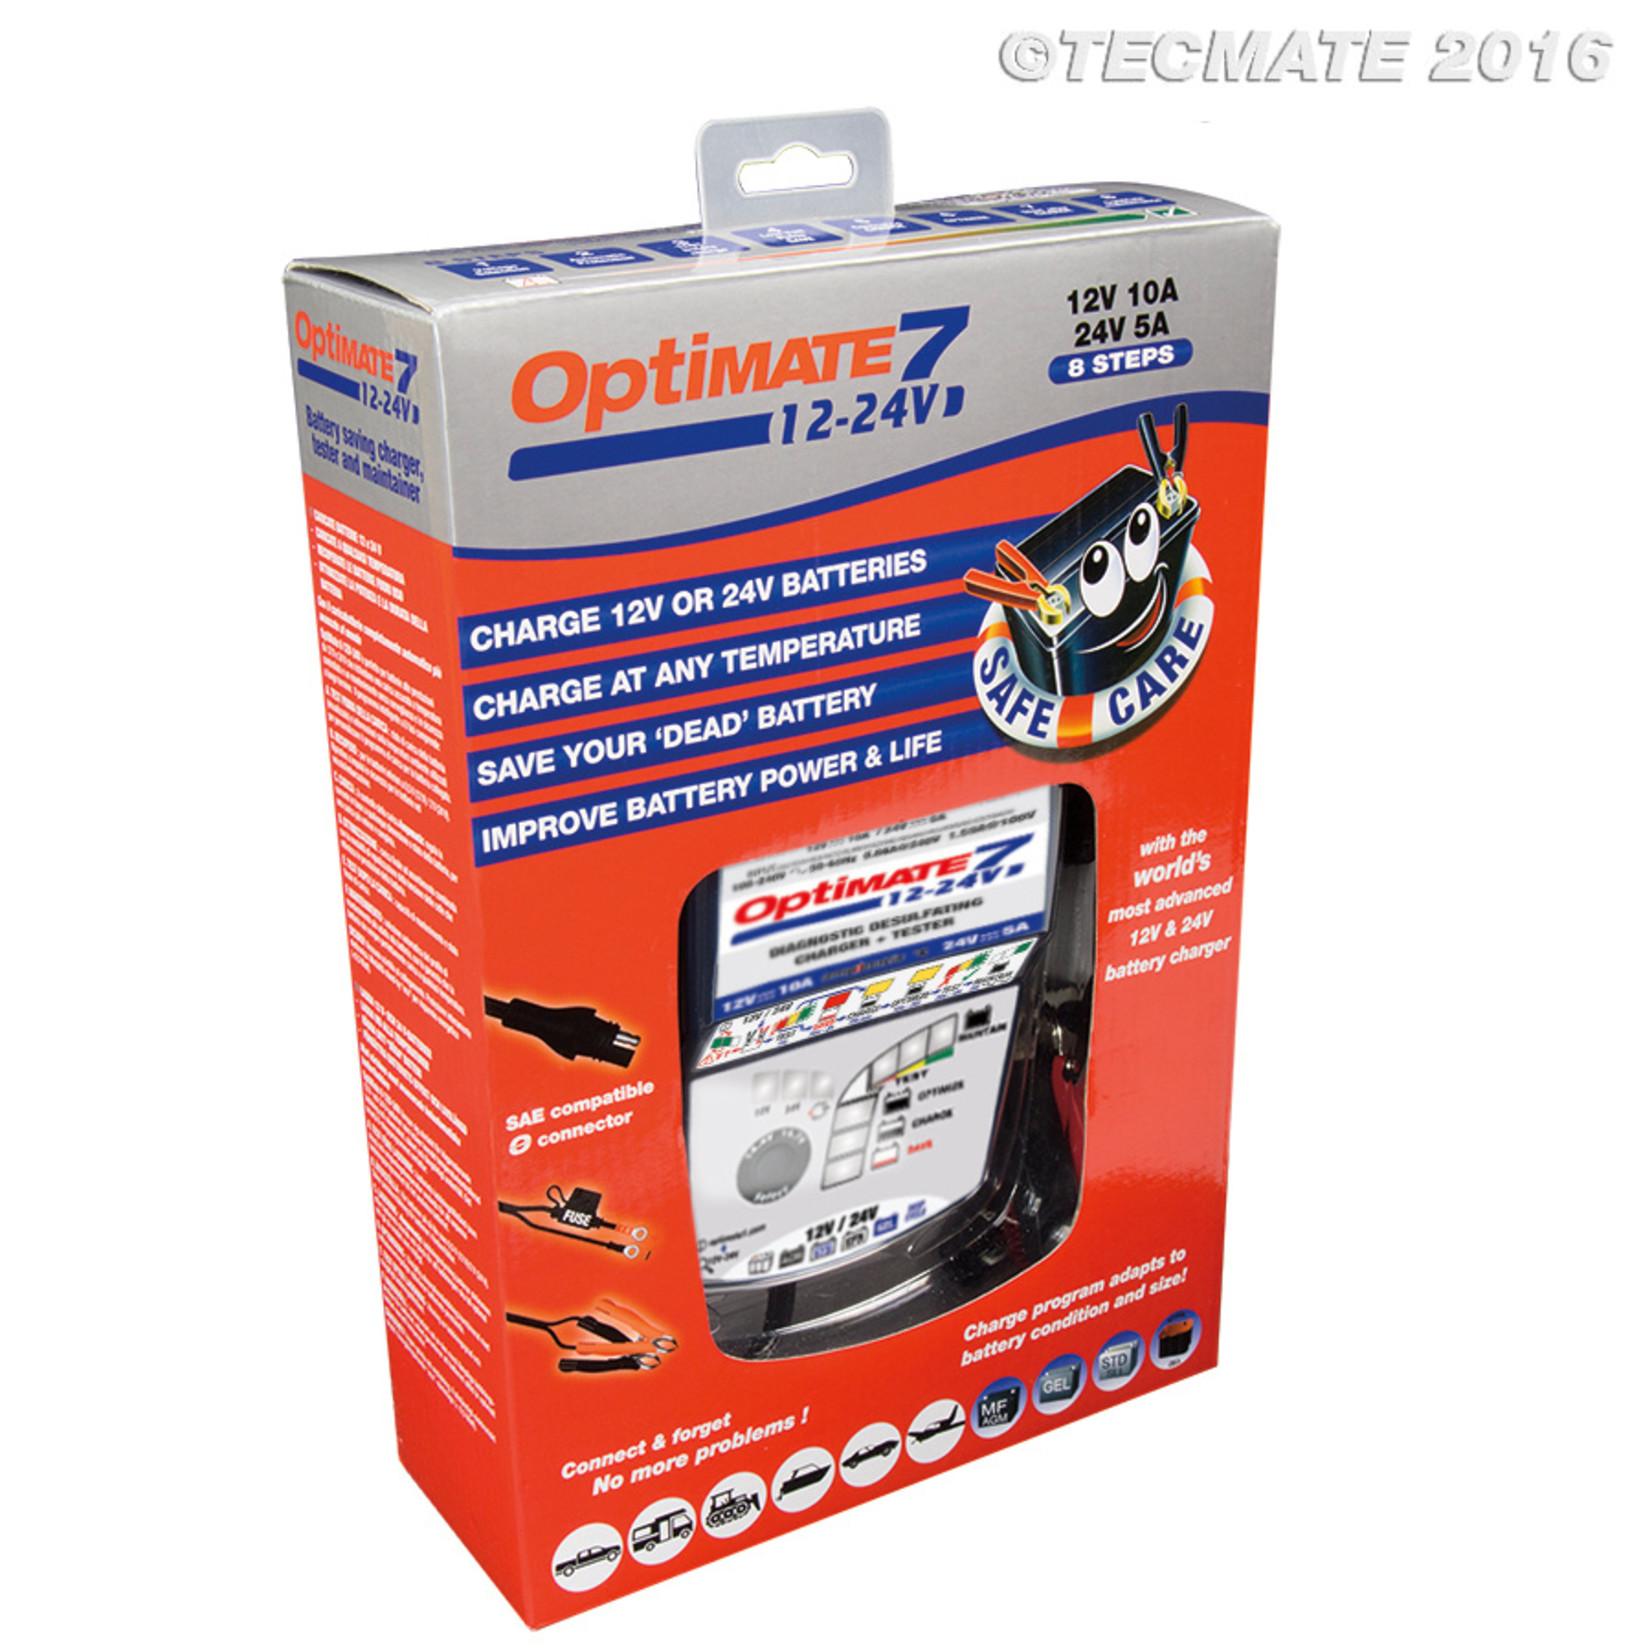 OptiMate OptiMate 7 12V-24V - Acculader